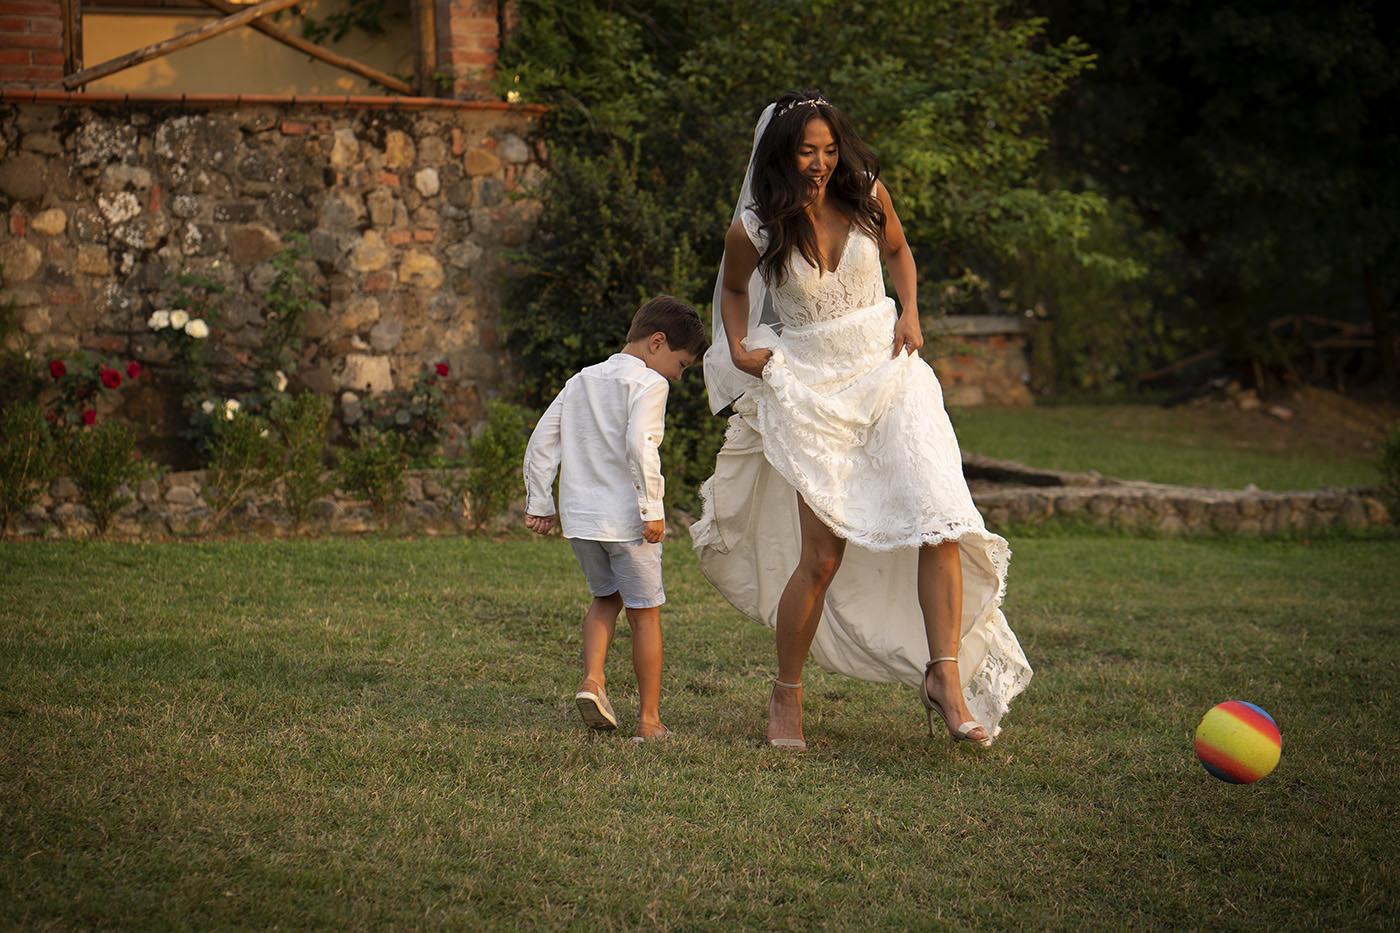 Duccio Argentini: Vows Renewal Photographer in Tuscany